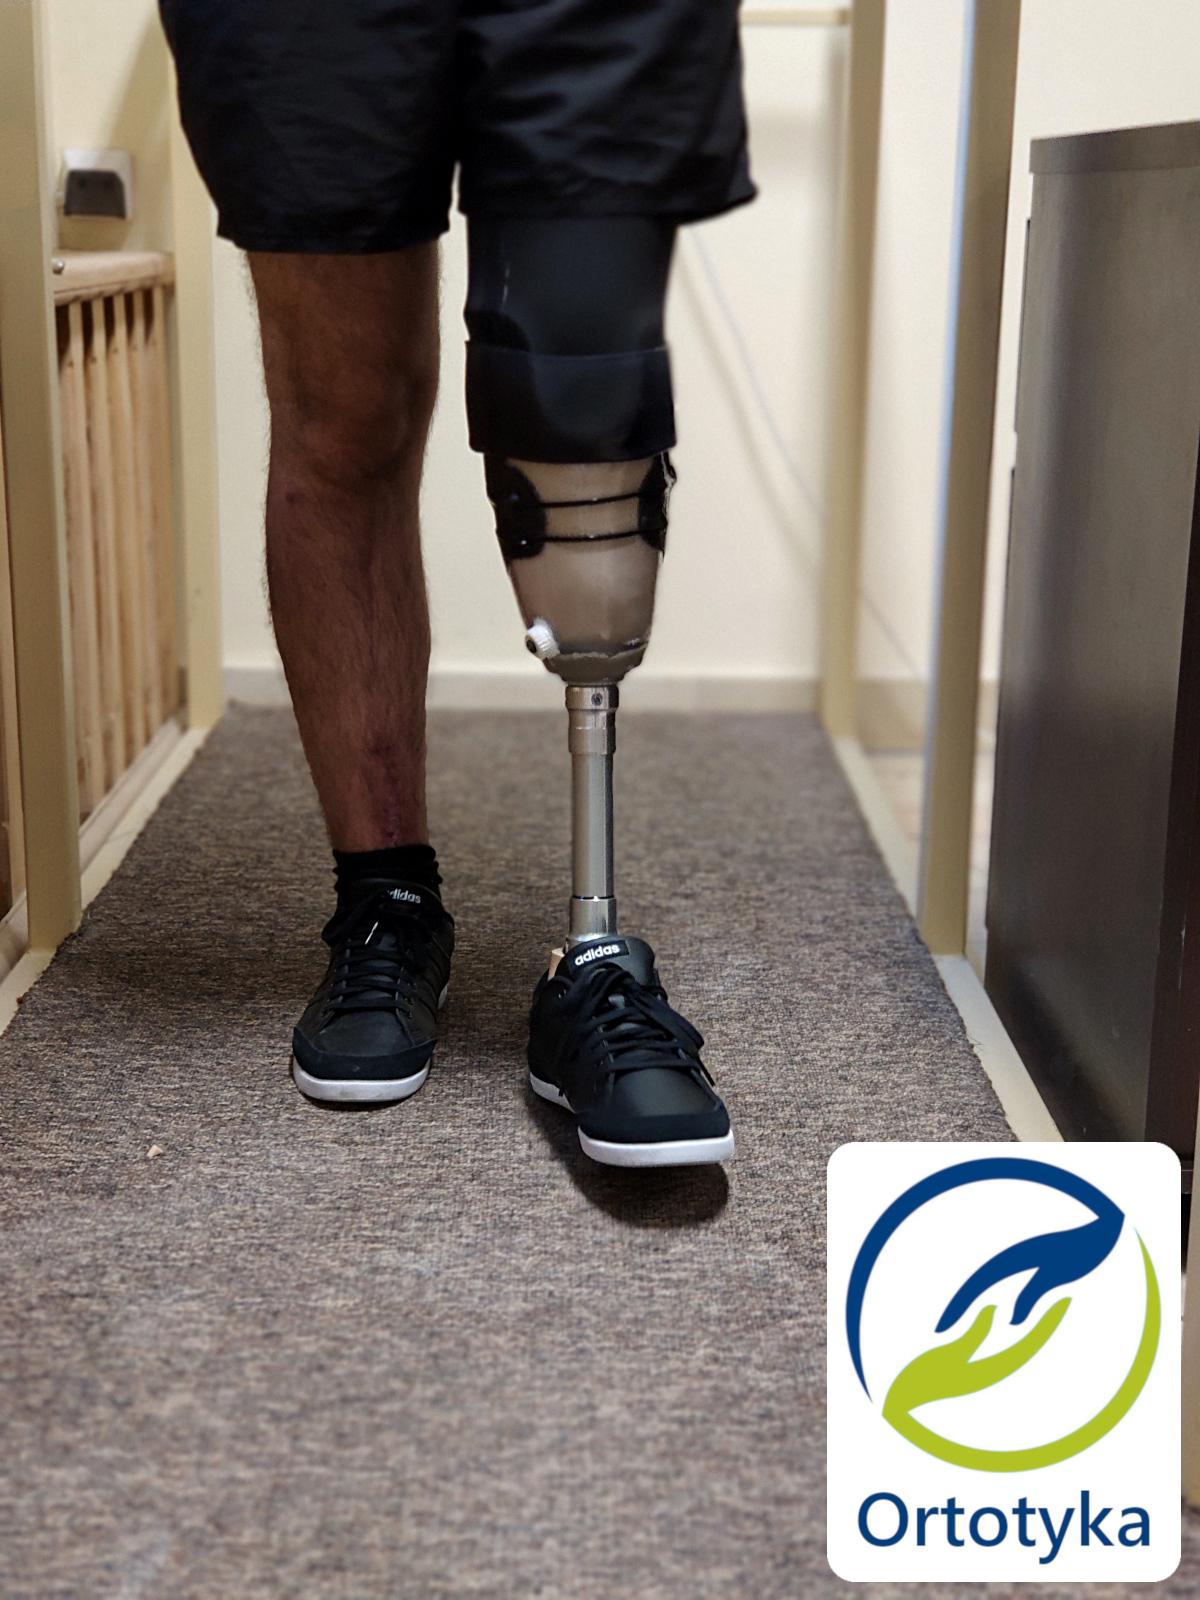 proteza-nogi-dofinansowanie